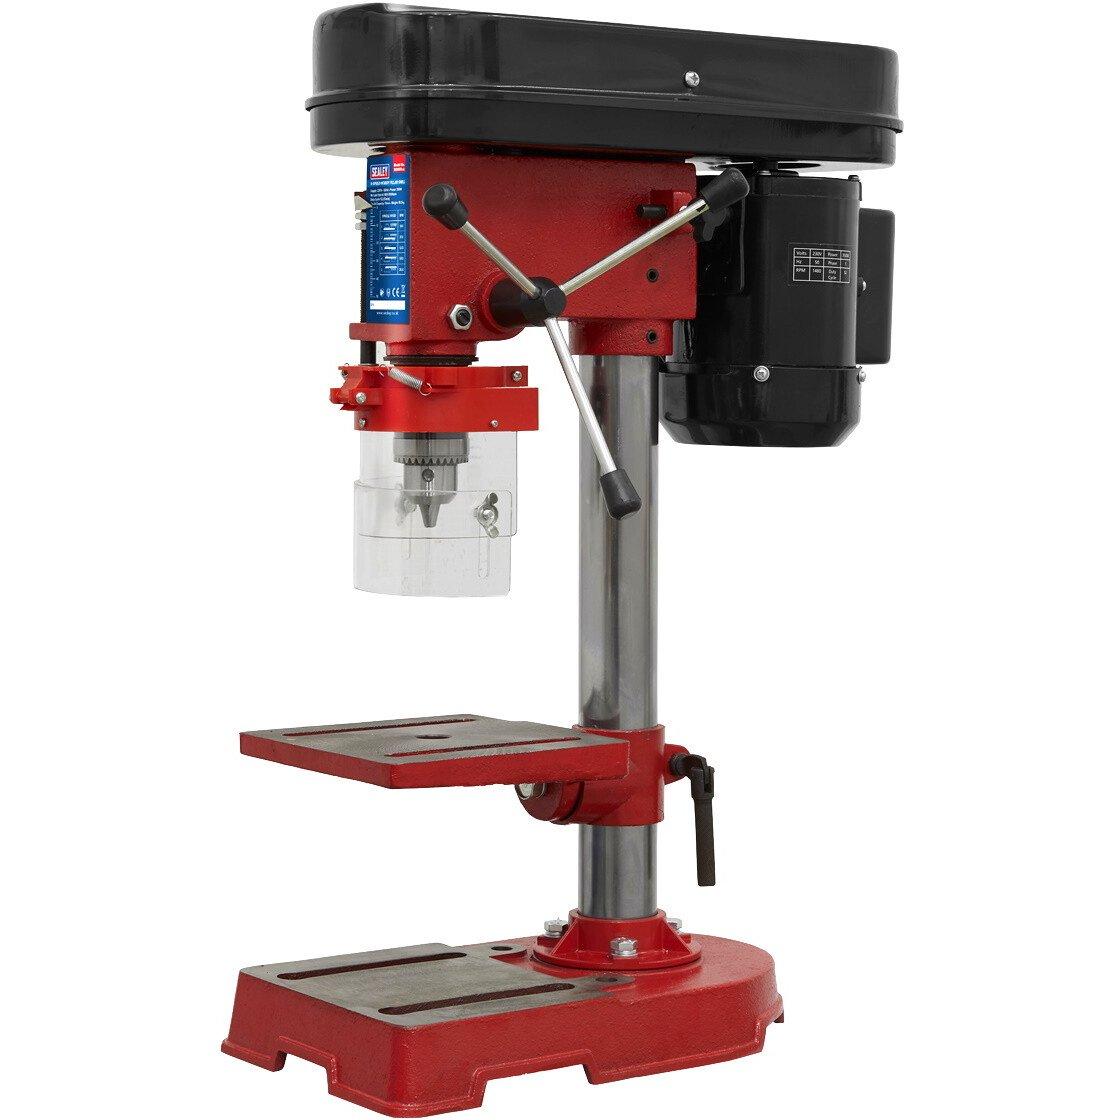 Sealey SDM30 5 Speed Bench Drill Press